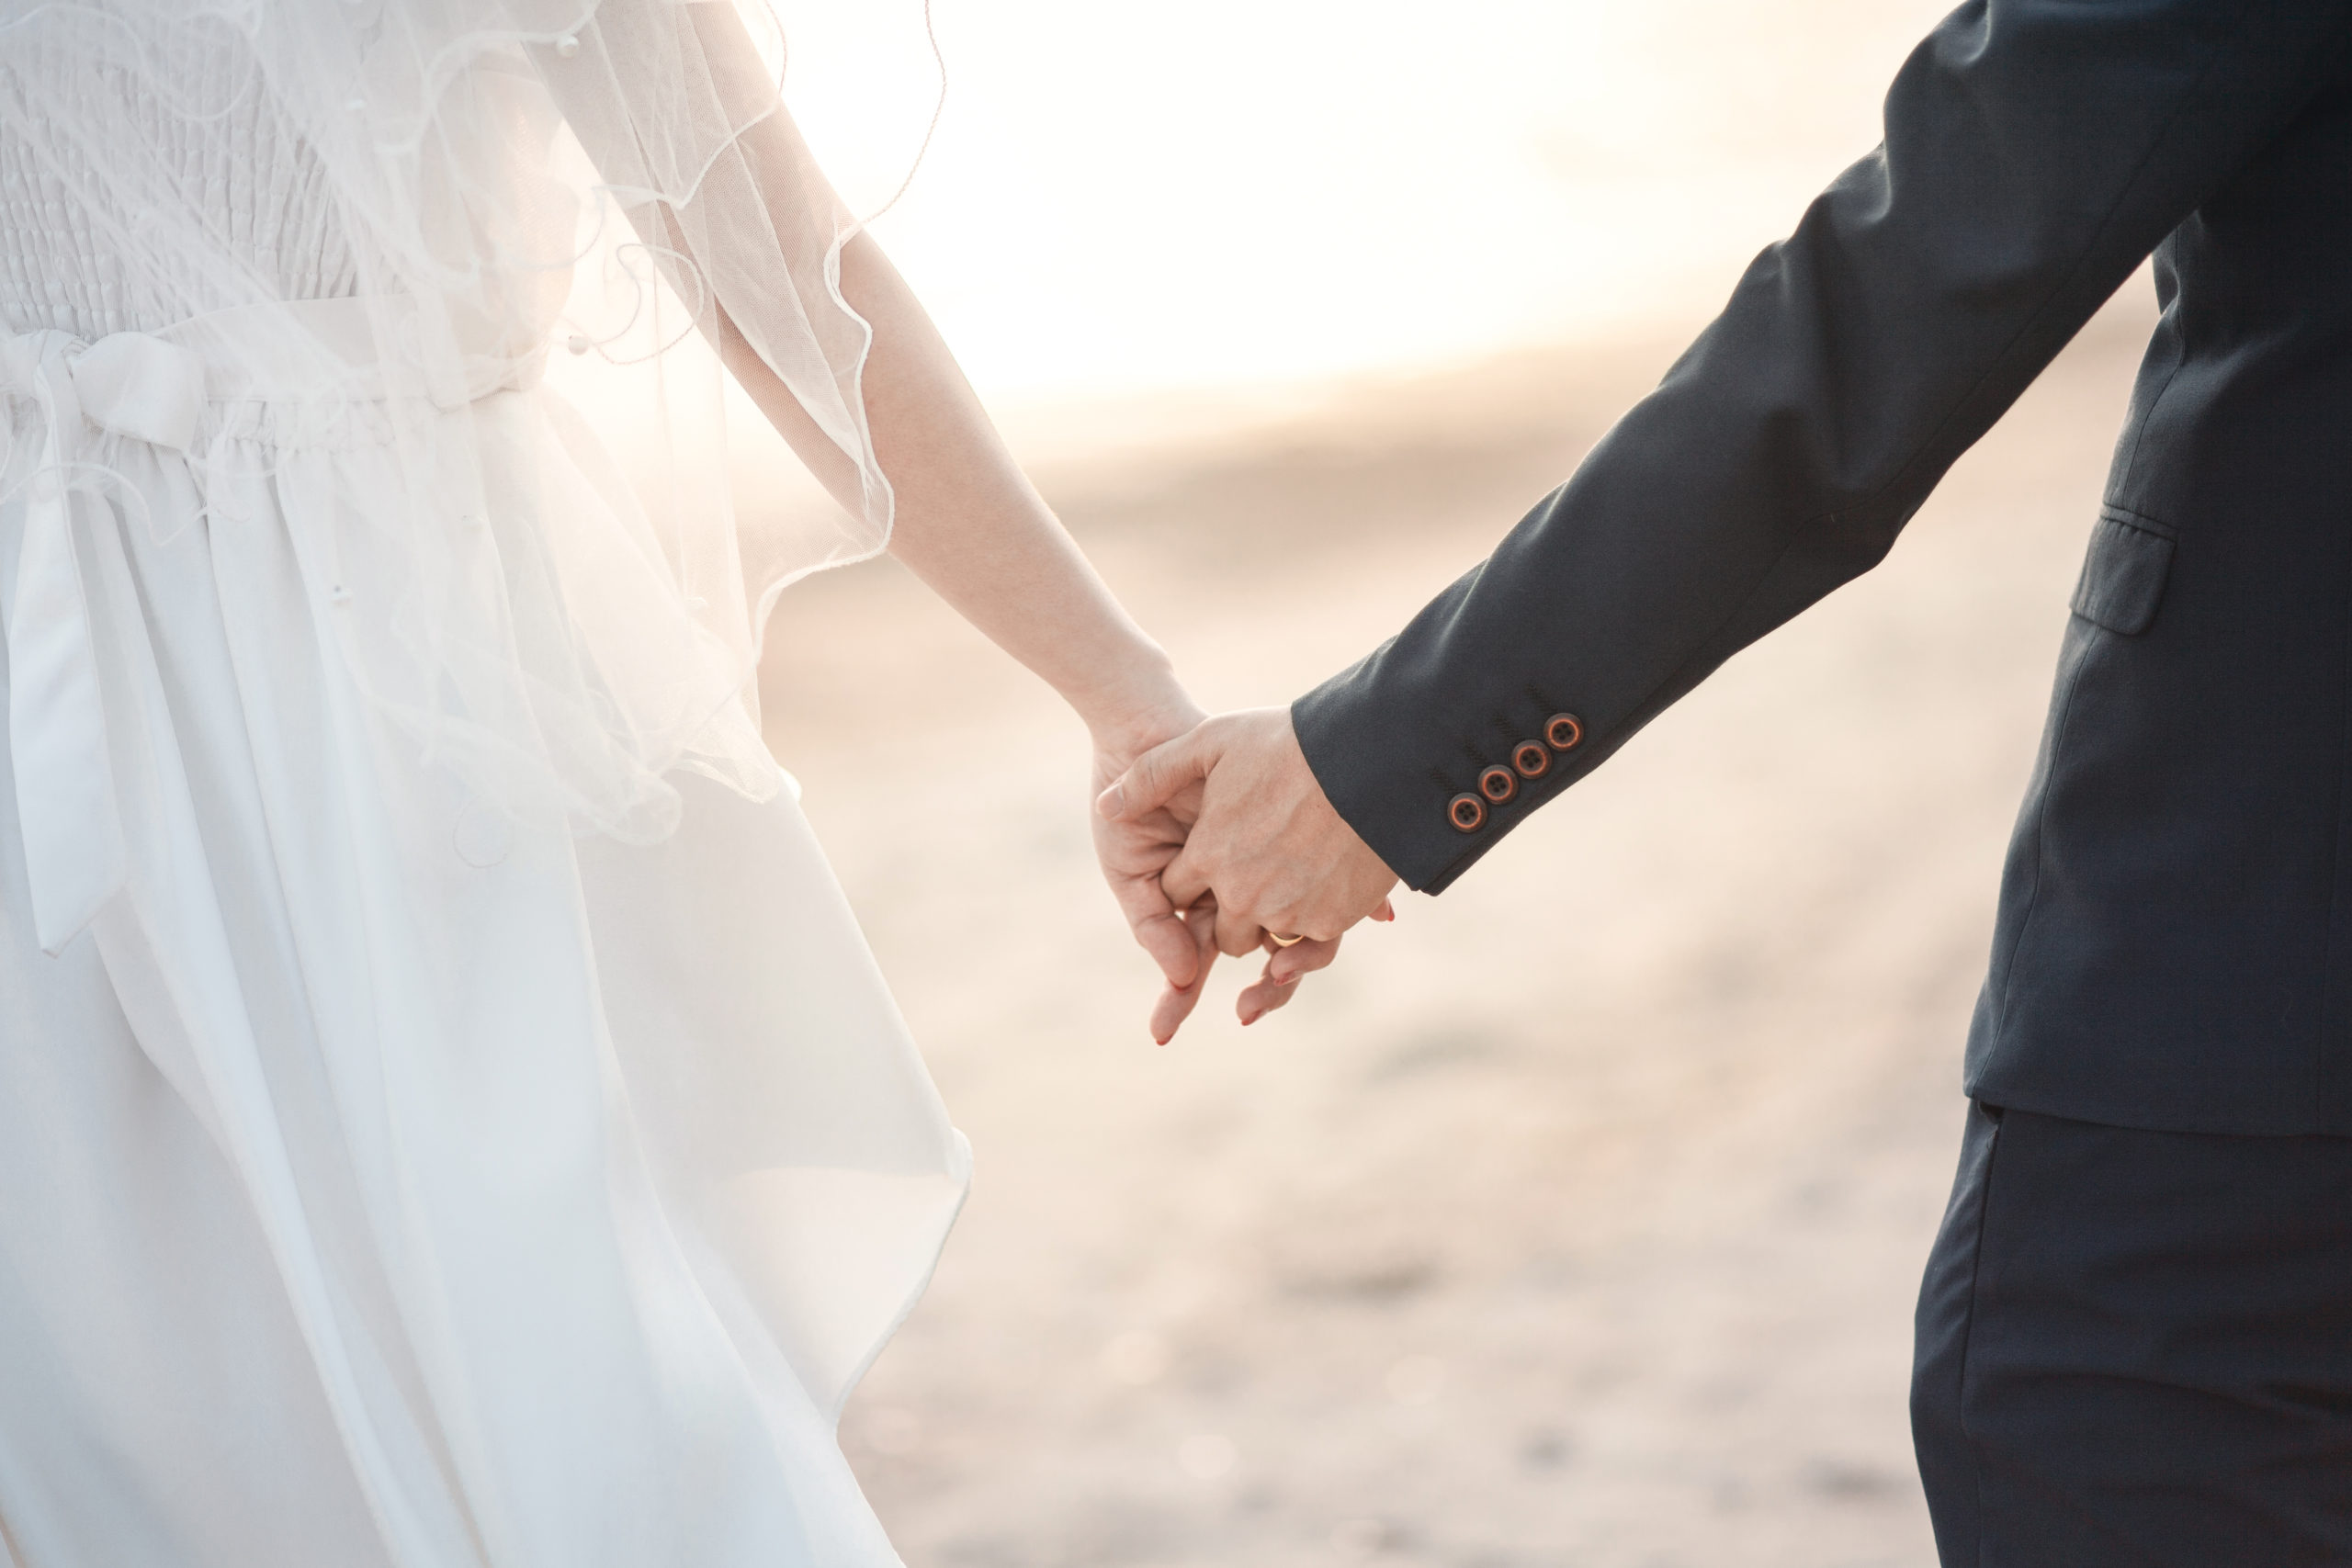 couples-shake-hands-wedding-show-love-1676630128